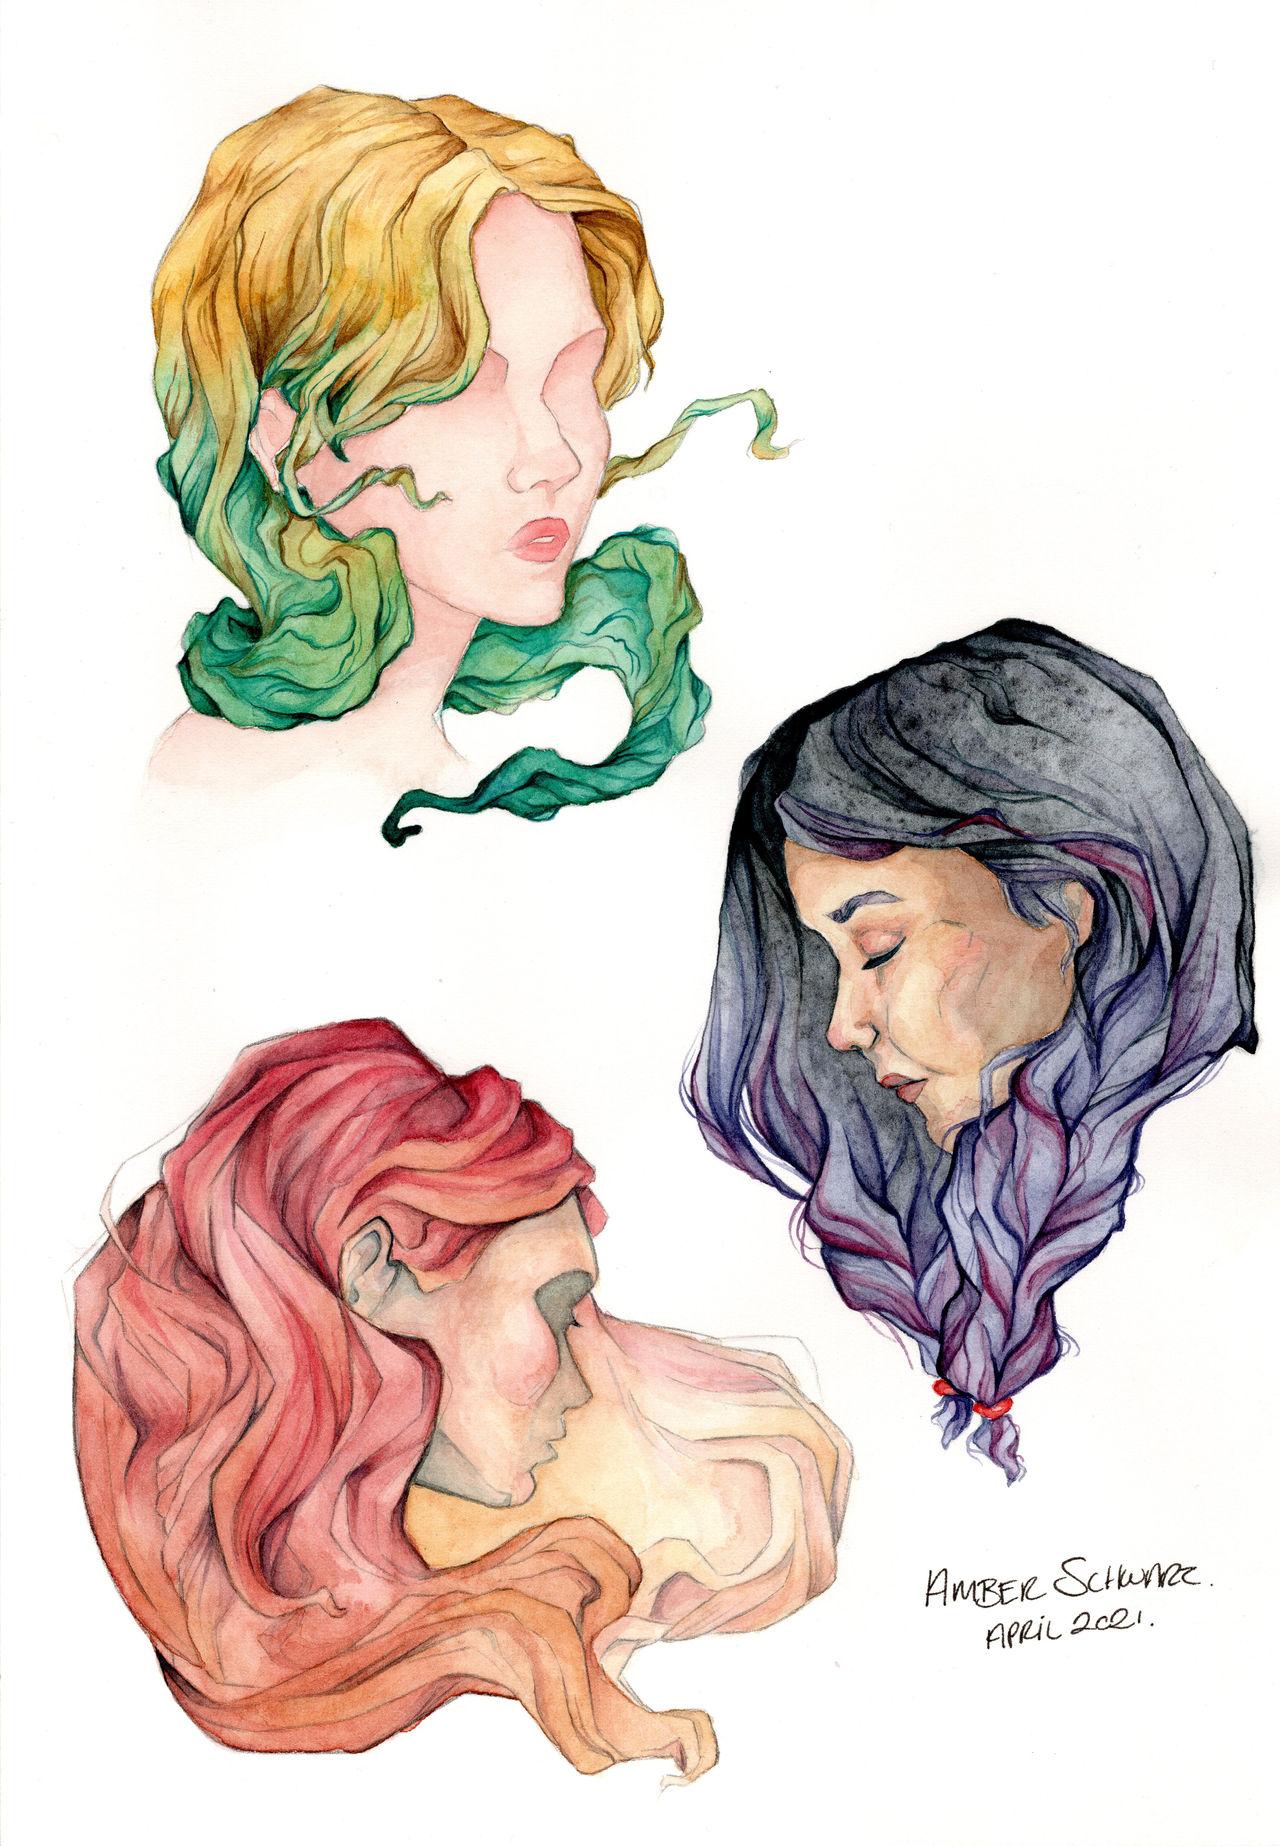 Final Three Faces